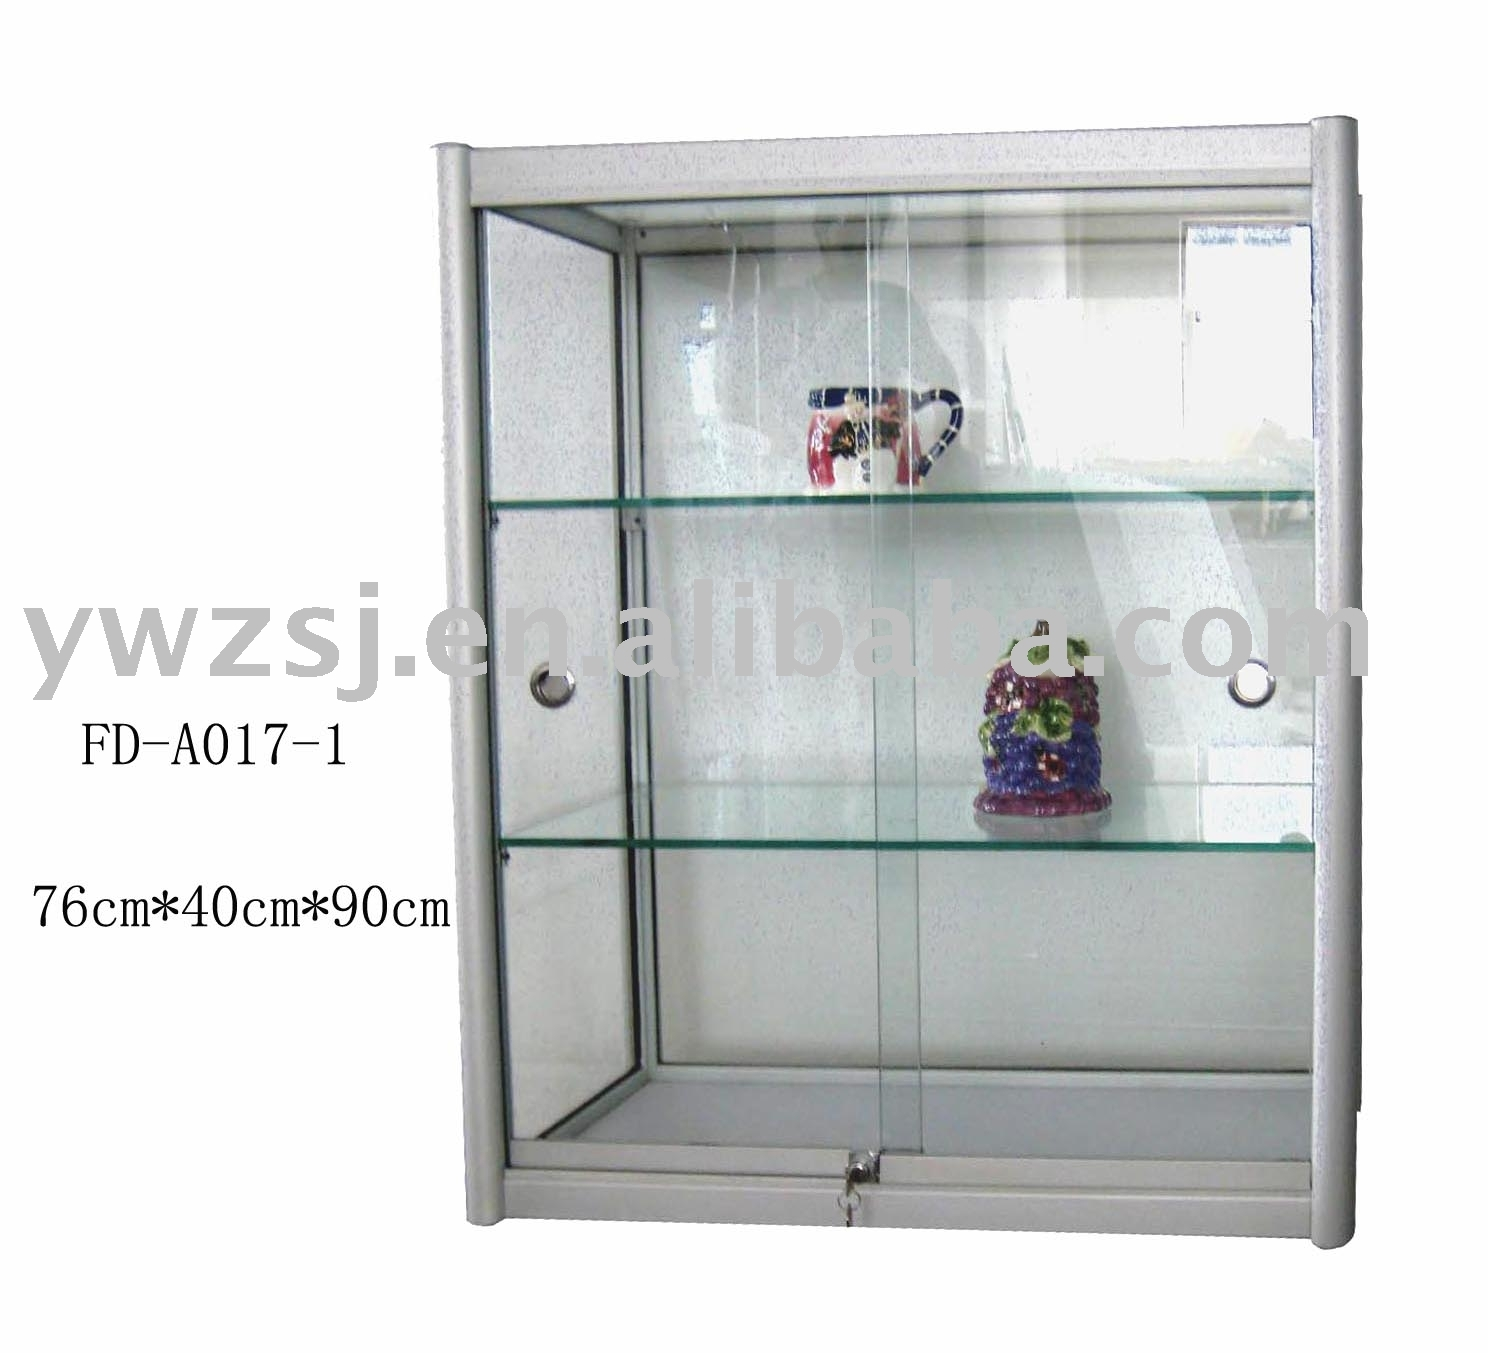 Sliding Glass Cabinet Door HandlesSliding Glass Cabinet Door Handles